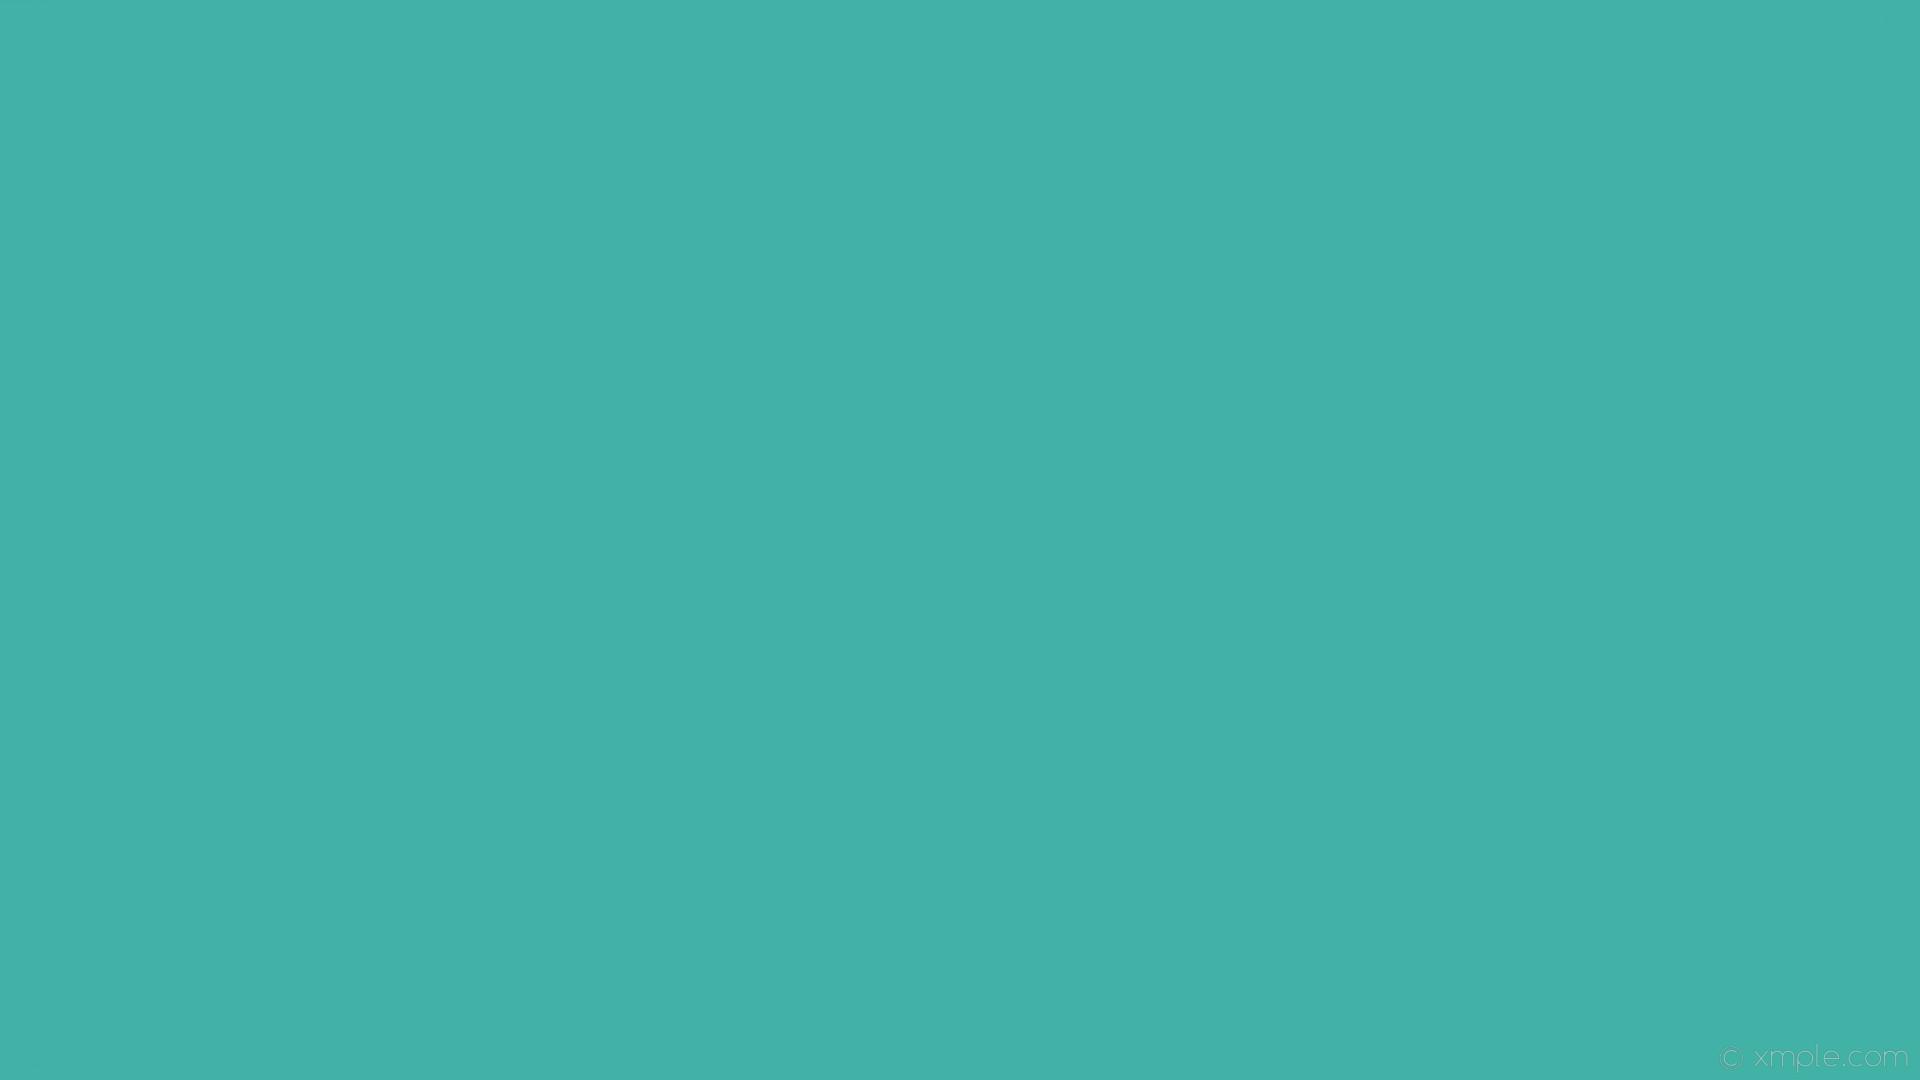 wallpaper cyan solid color plain single one colour #41b2a5